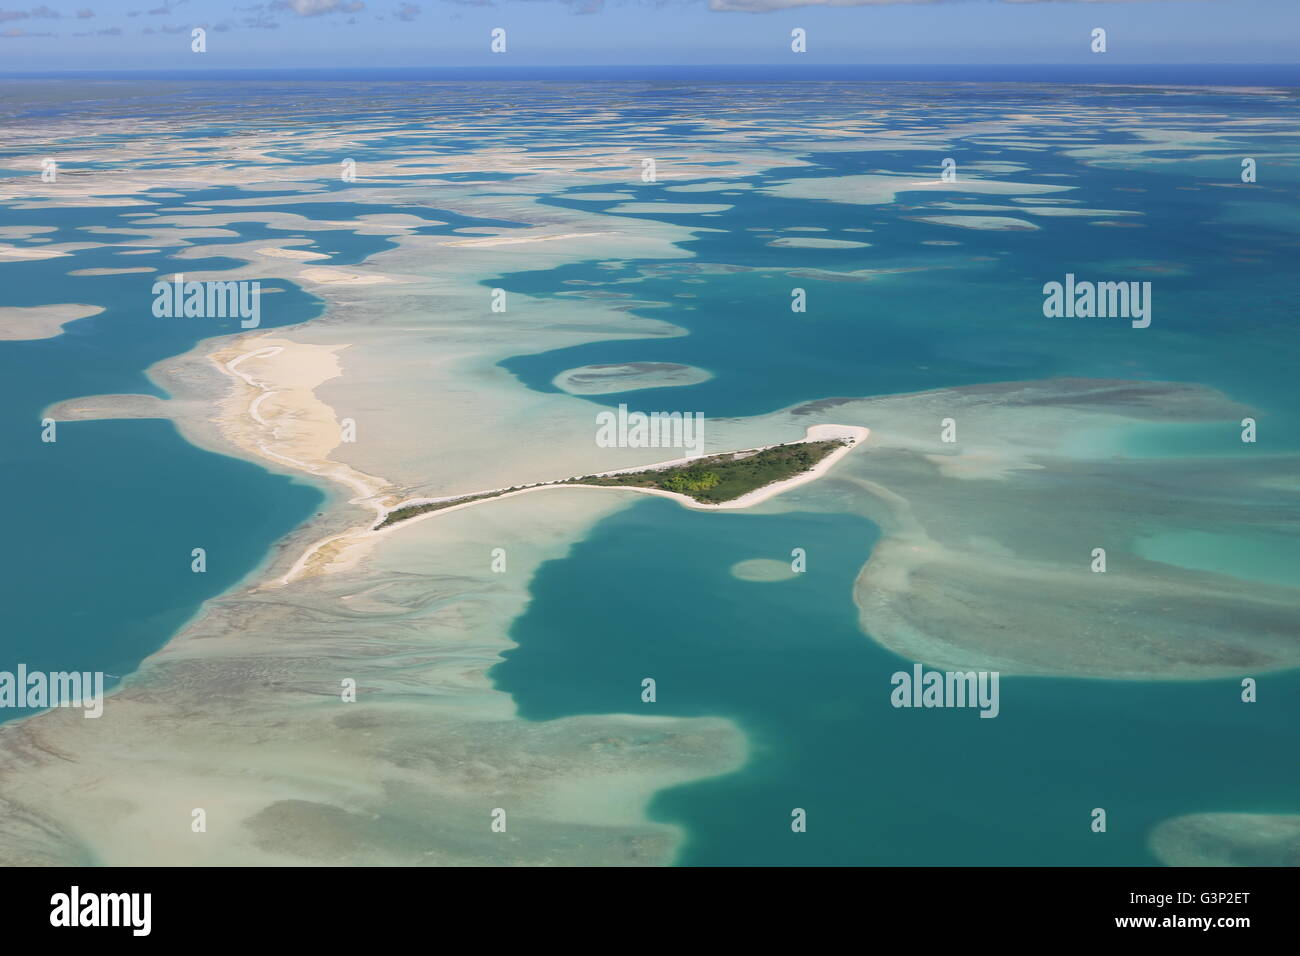 Aerial view of Motu Tabu Islet in blue lagoon of Christmas Island (Kiritimati), Kiribati - Stock Image